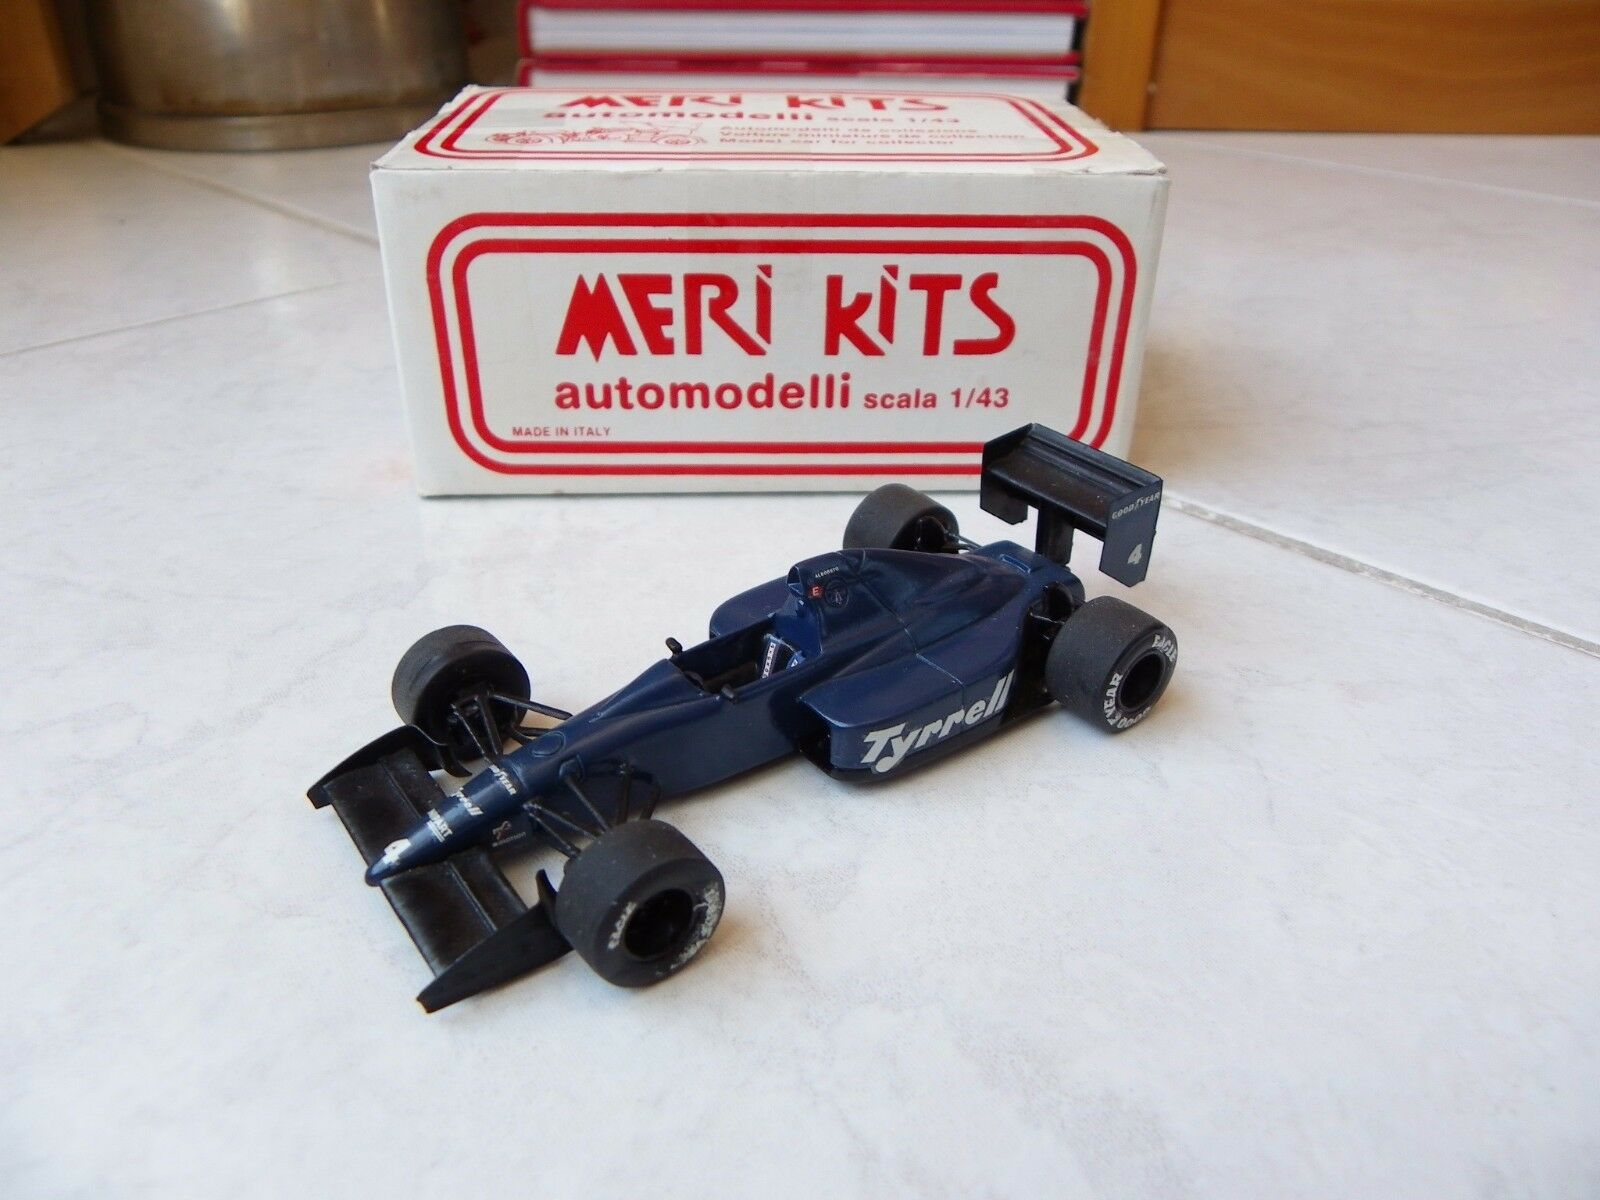 Ford tyrrell 018 michele alboreto  4 gp monaco  1989 meri kits kit built 1 43 f1  le plus en vogue